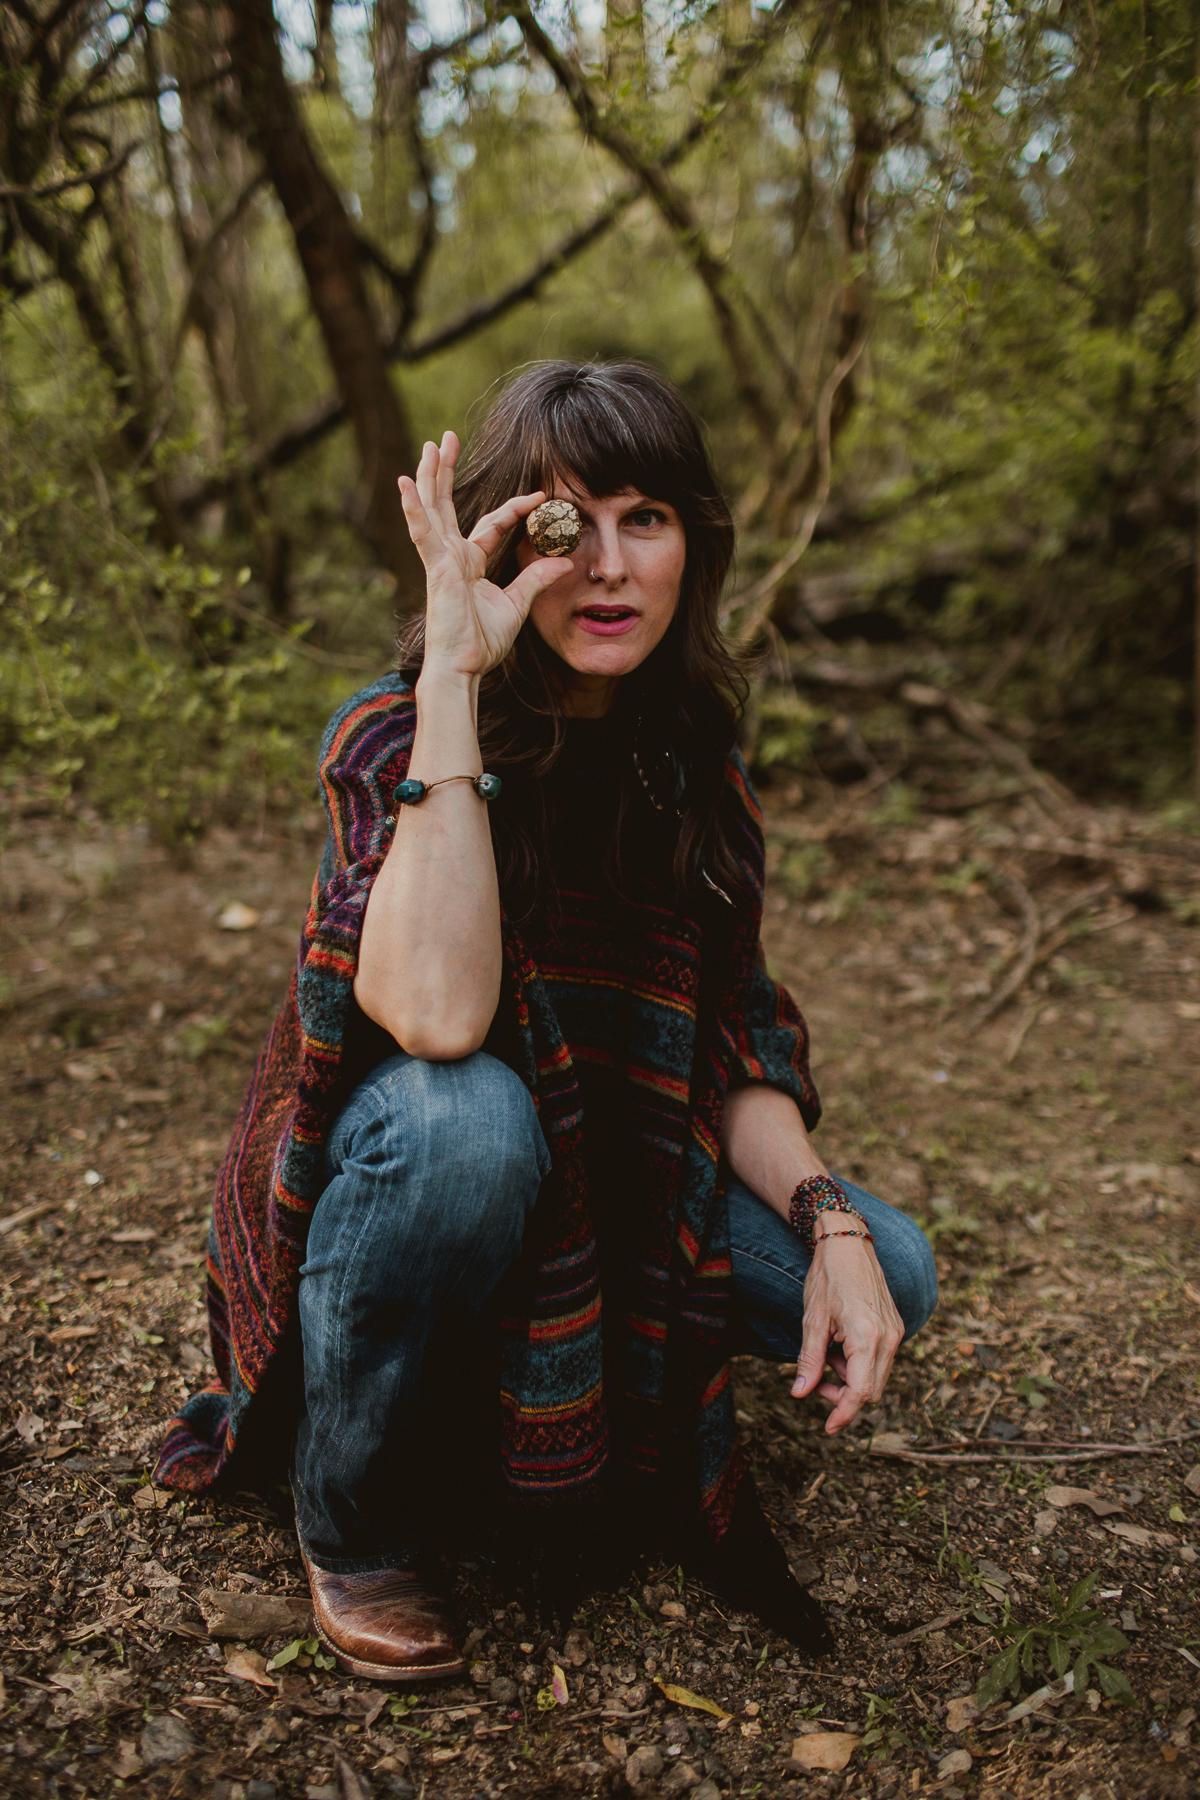 michelle-kelley-raye-atlanta-los-angeles-branding-photographer-40.jpg